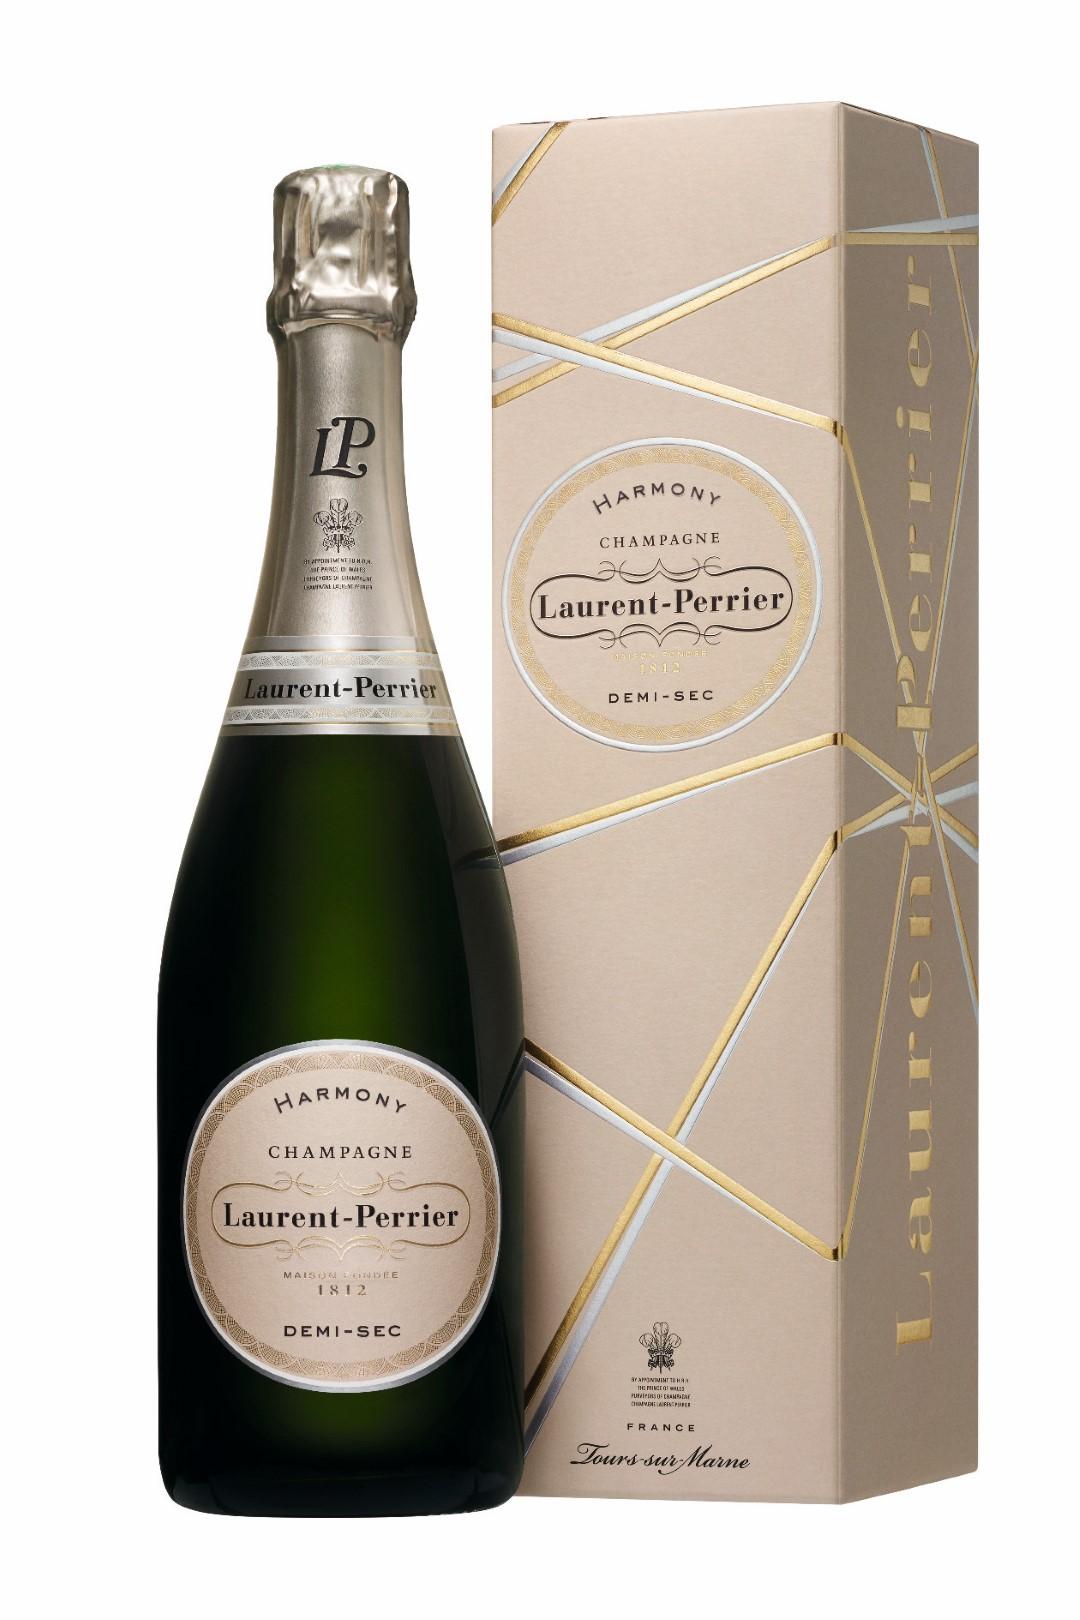 NV Laurent-Perrier ChampagneHarmony Demi-Sec